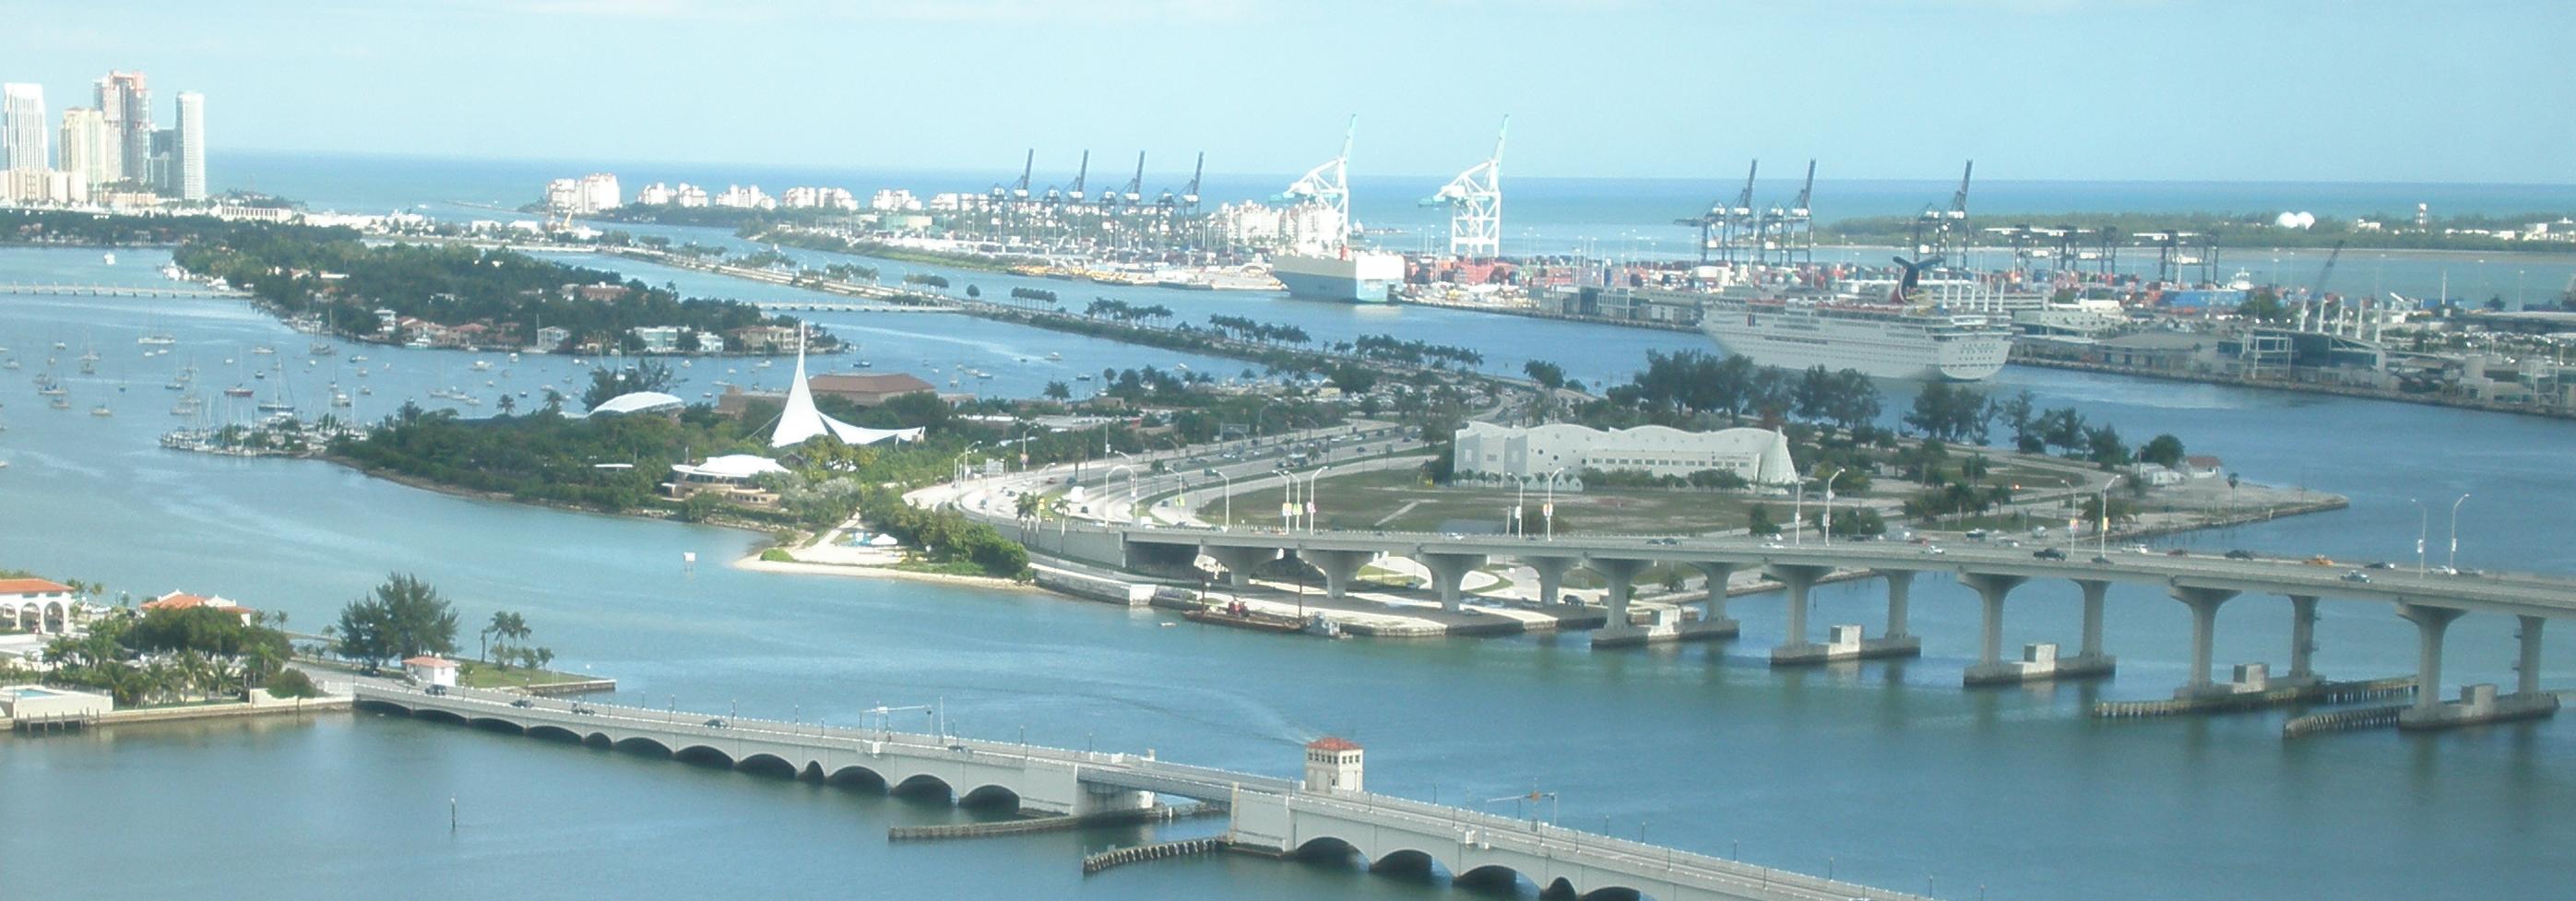 Miami Beach Causeway